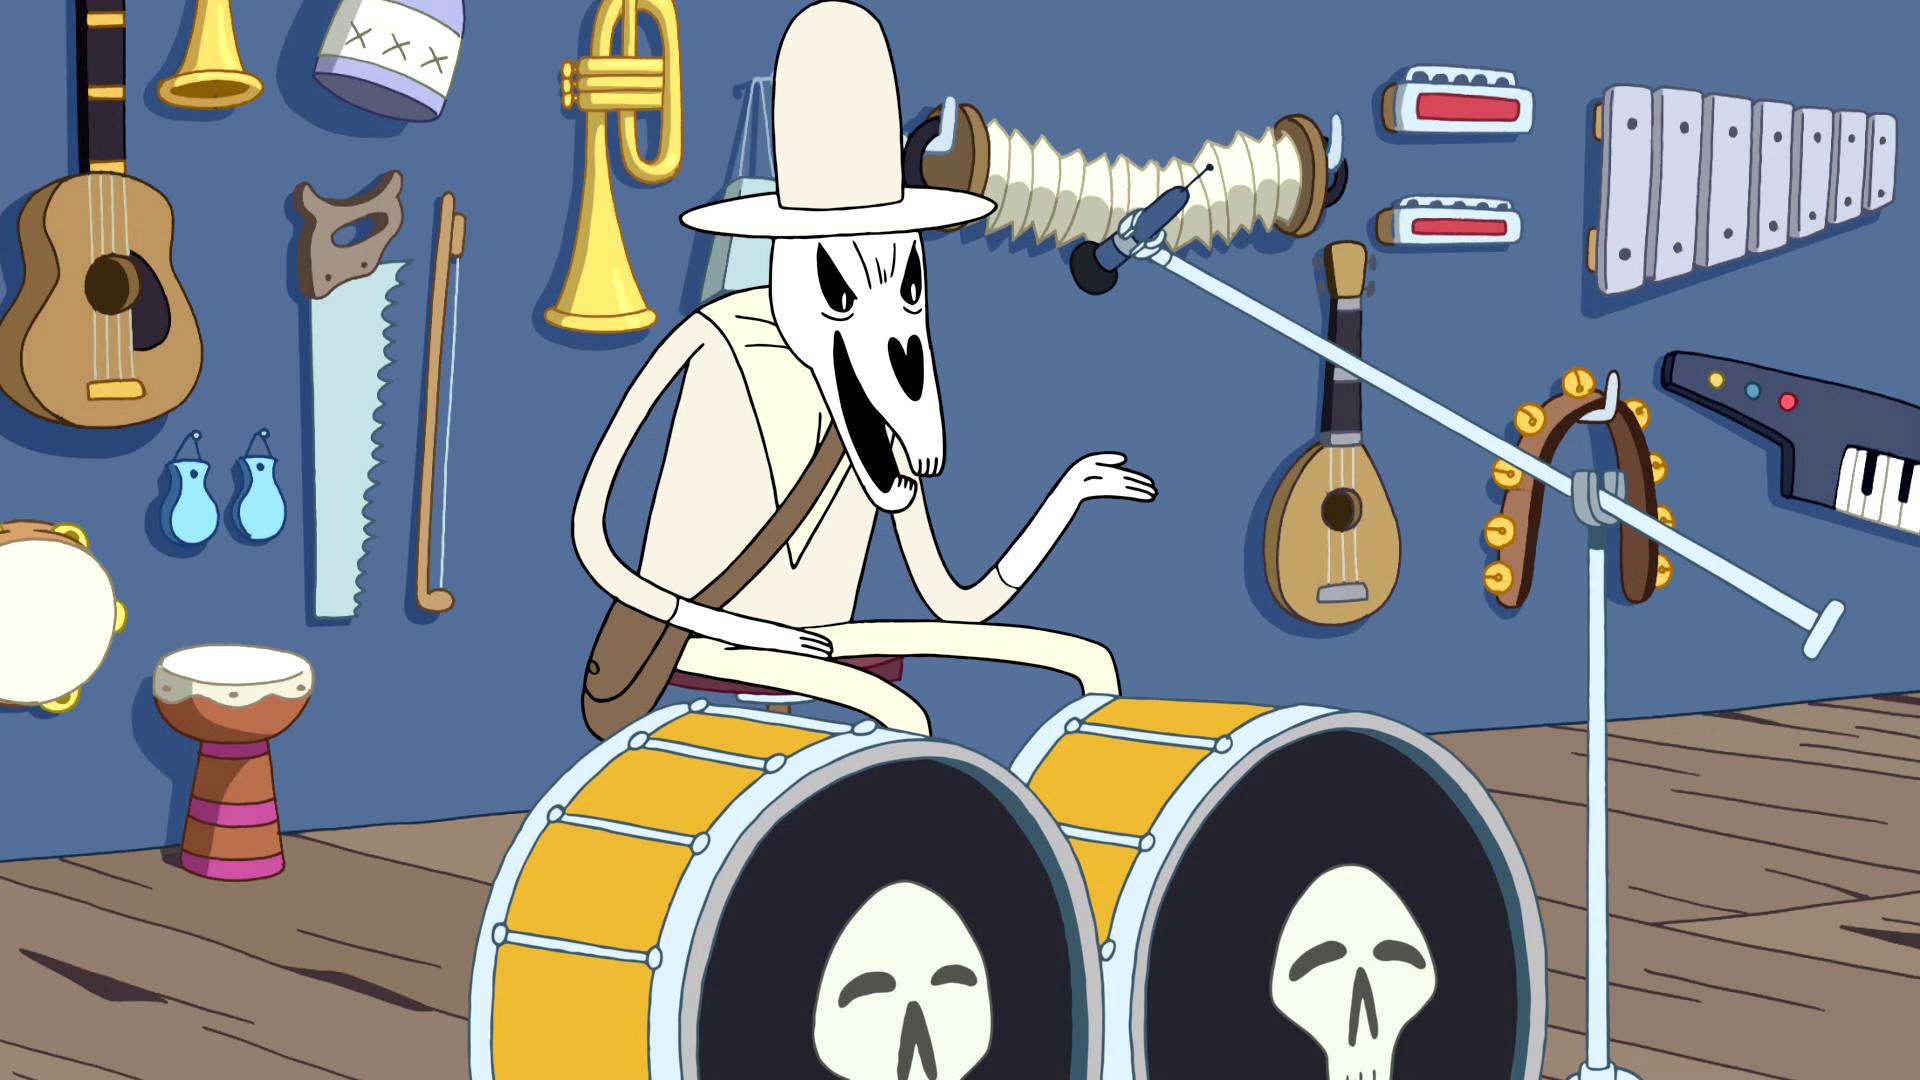 S2e17 Versus Death in a musical battle